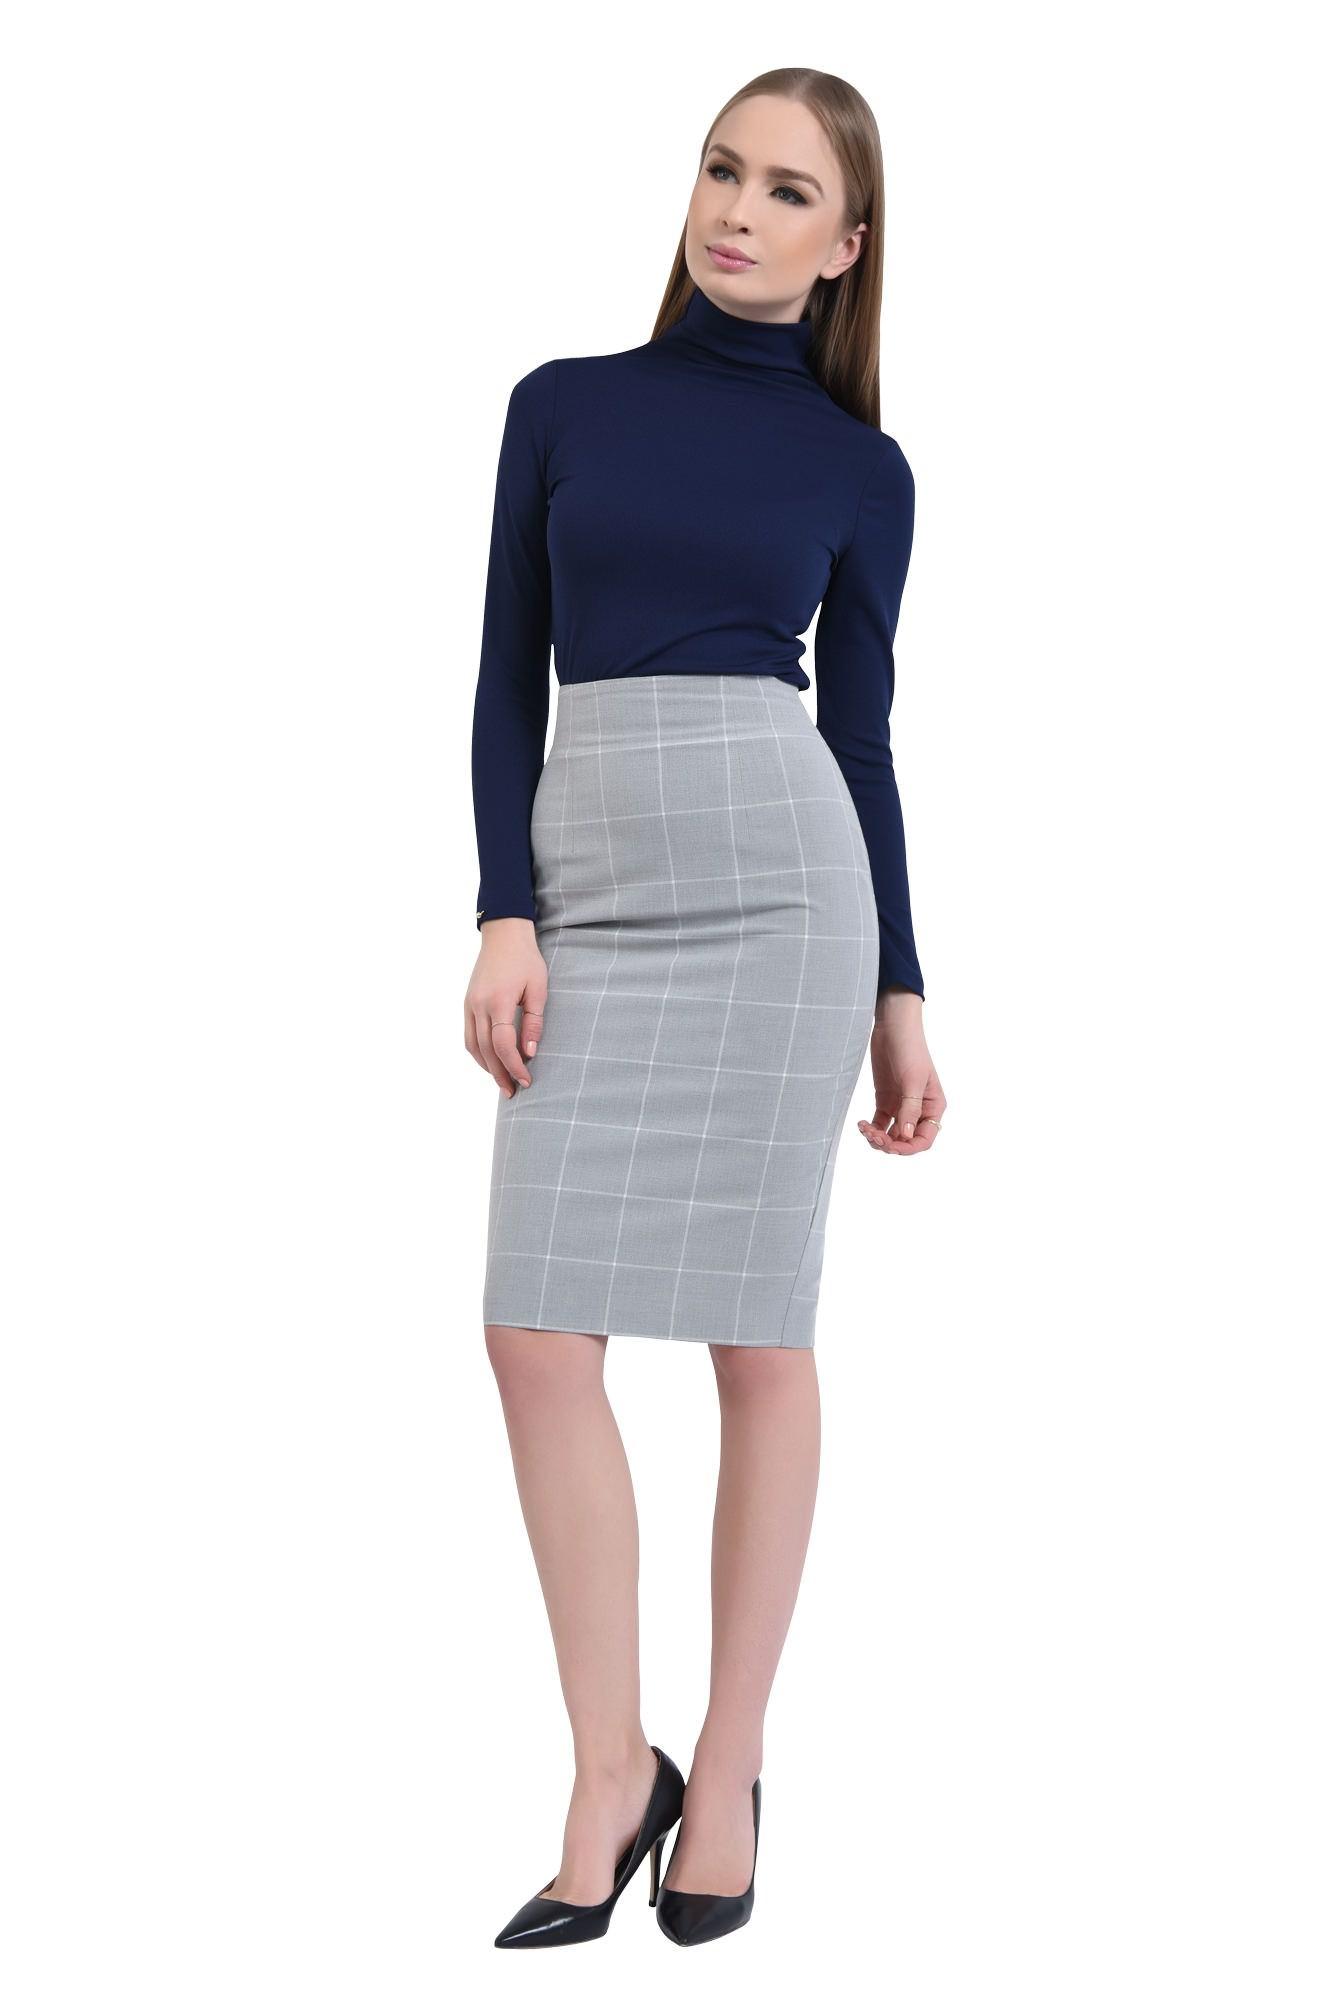 360 - Bluza casual stretch, elastan, helanca